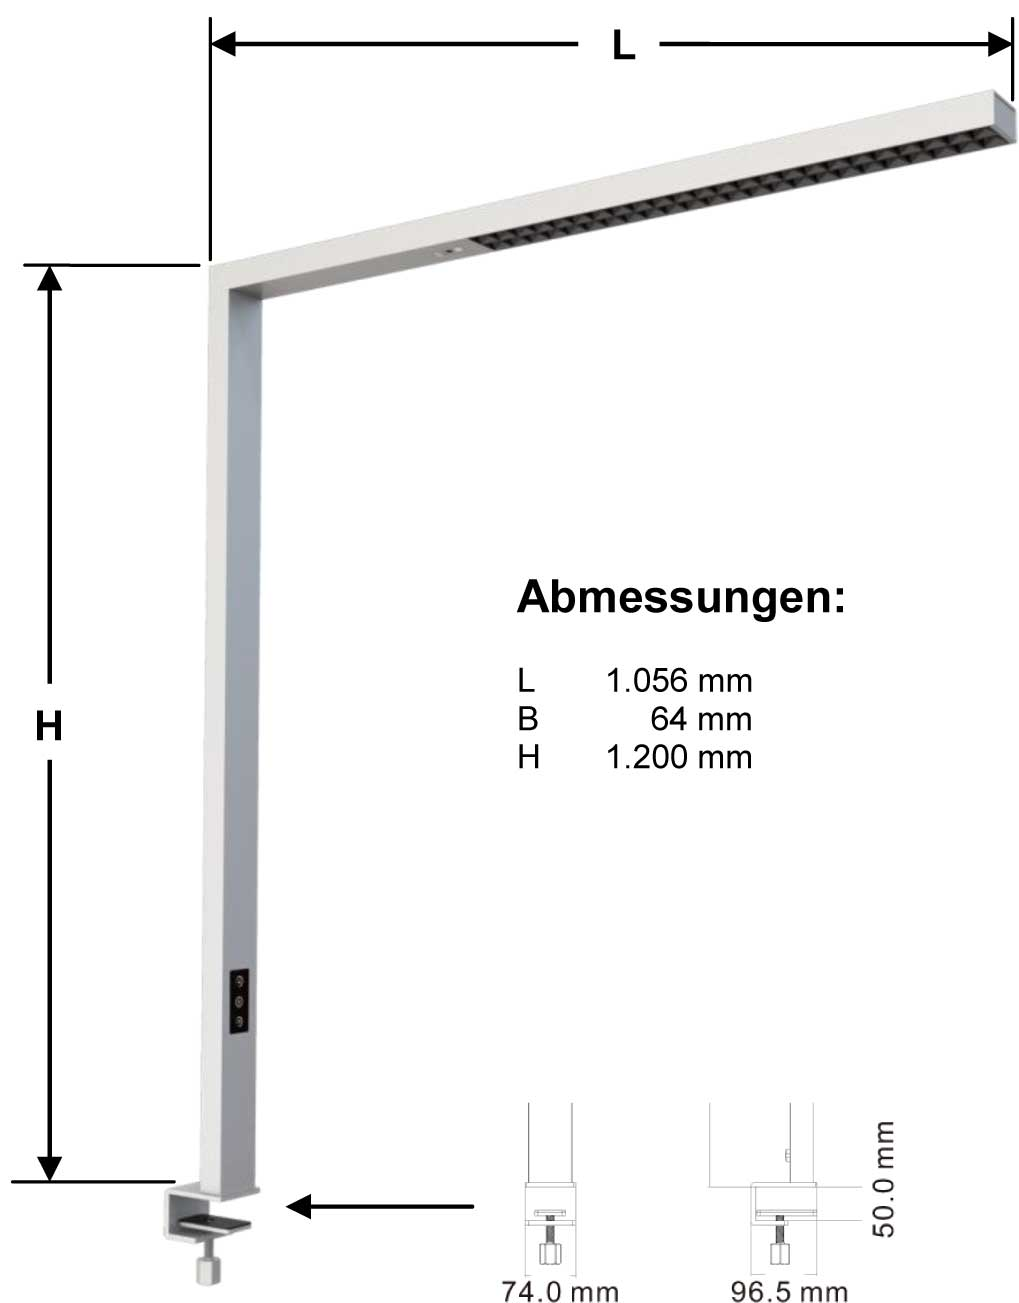 LEDAXO LED-Arbeitsplatzleuchte AL-06 Abmessungen